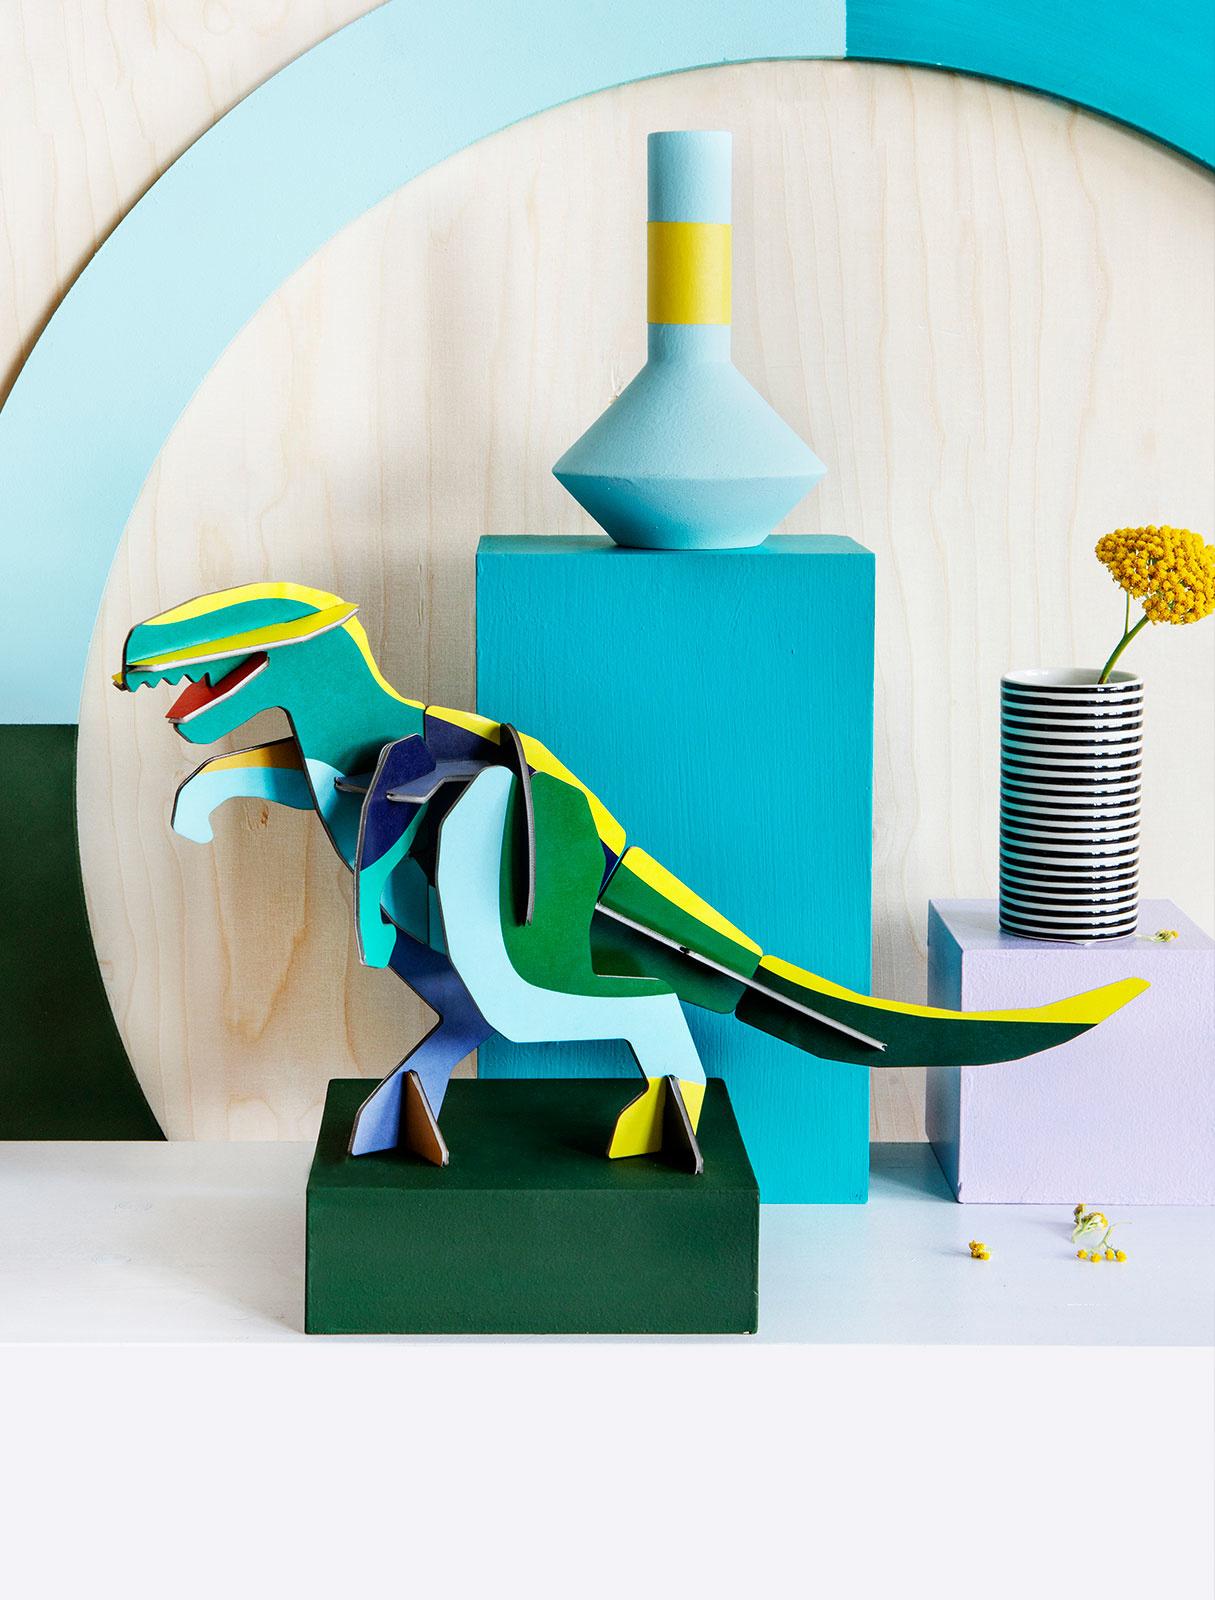 Studio Roof Construction kit Giant Totem T-Rex